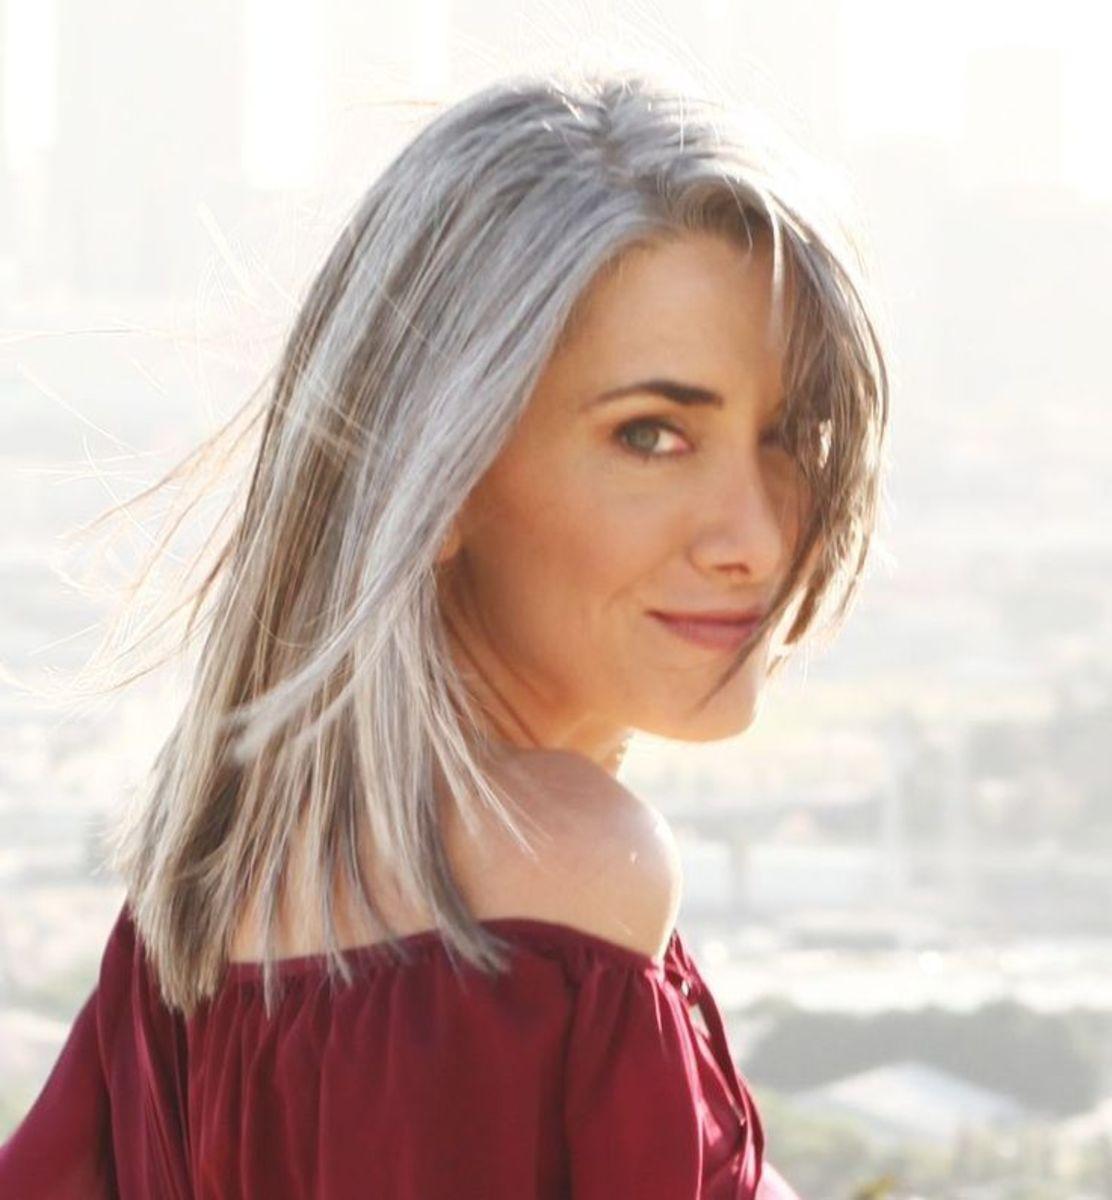 Silver Fox Hair Styles For Medium Texture Wavy Hair Bellatory